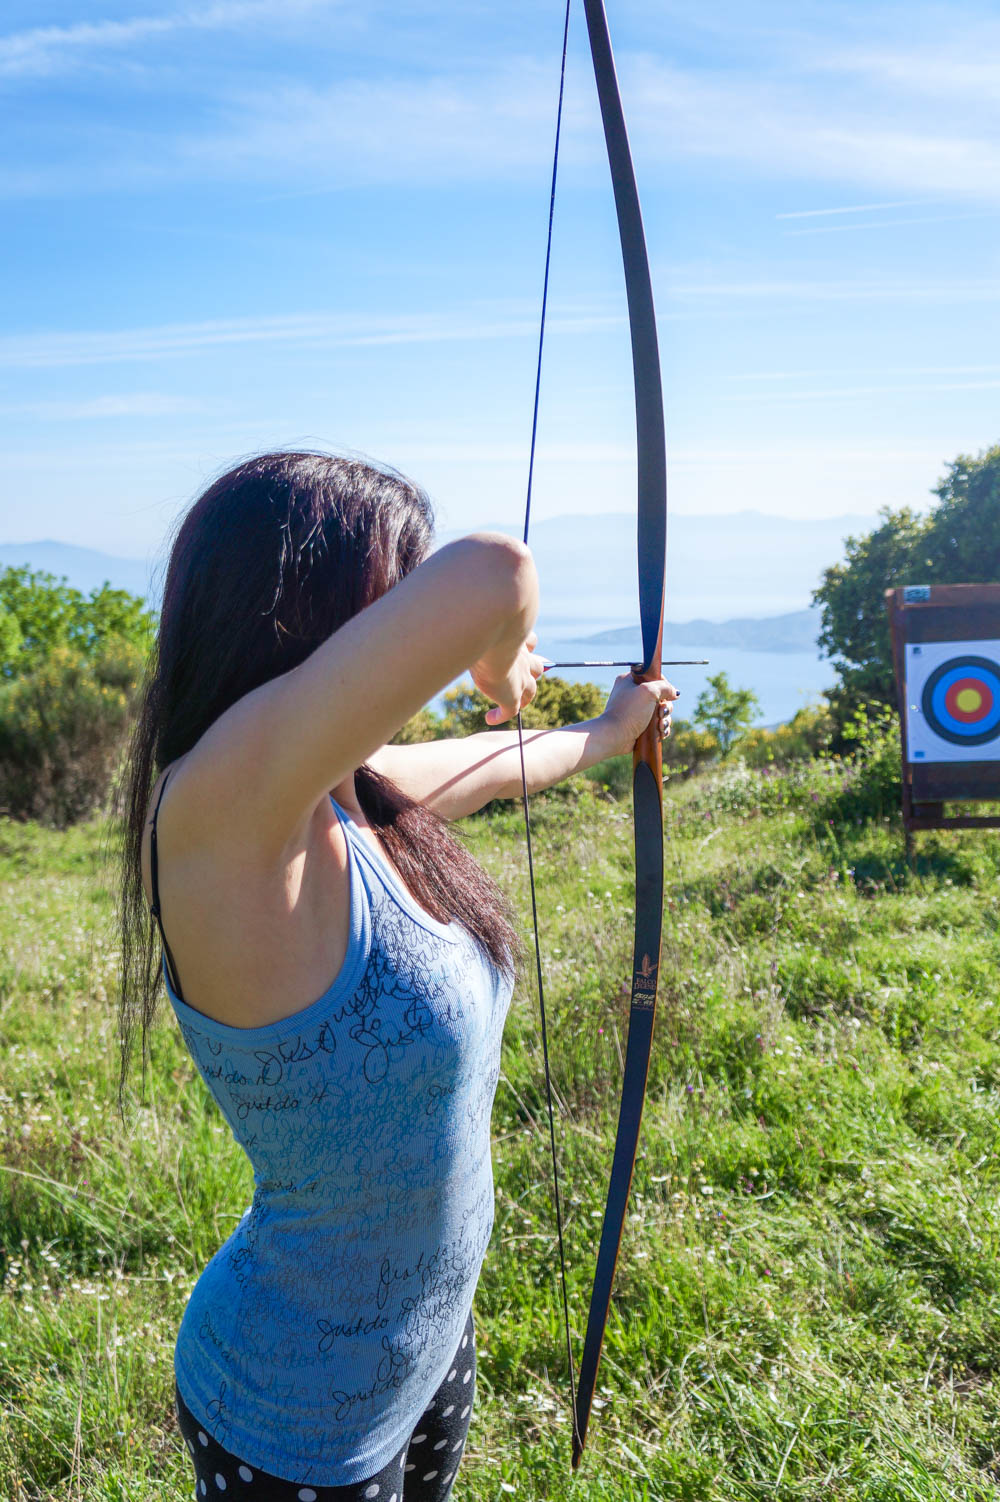 archery-pelion-greece-la-vie-en-blog-all-rights-reserved-4